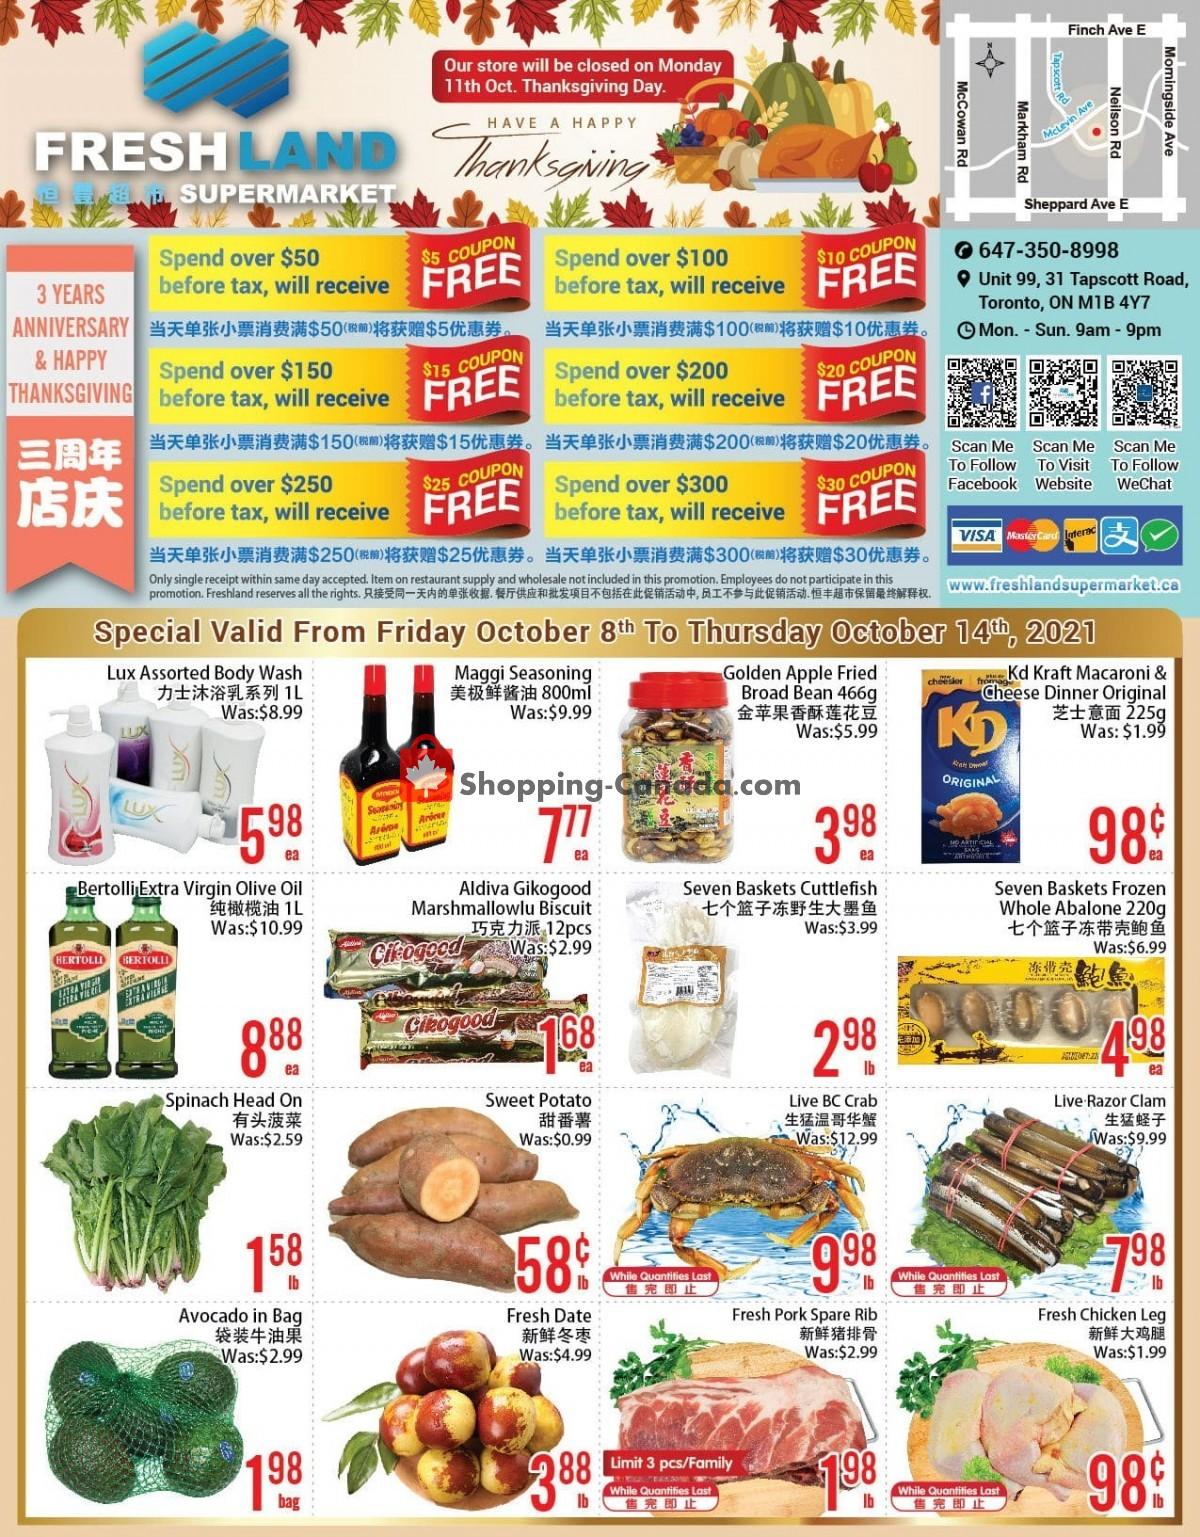 Flyer FreshLand Supermarket Canada - from Friday October 8, 2021 to Thursday October 14, 2021